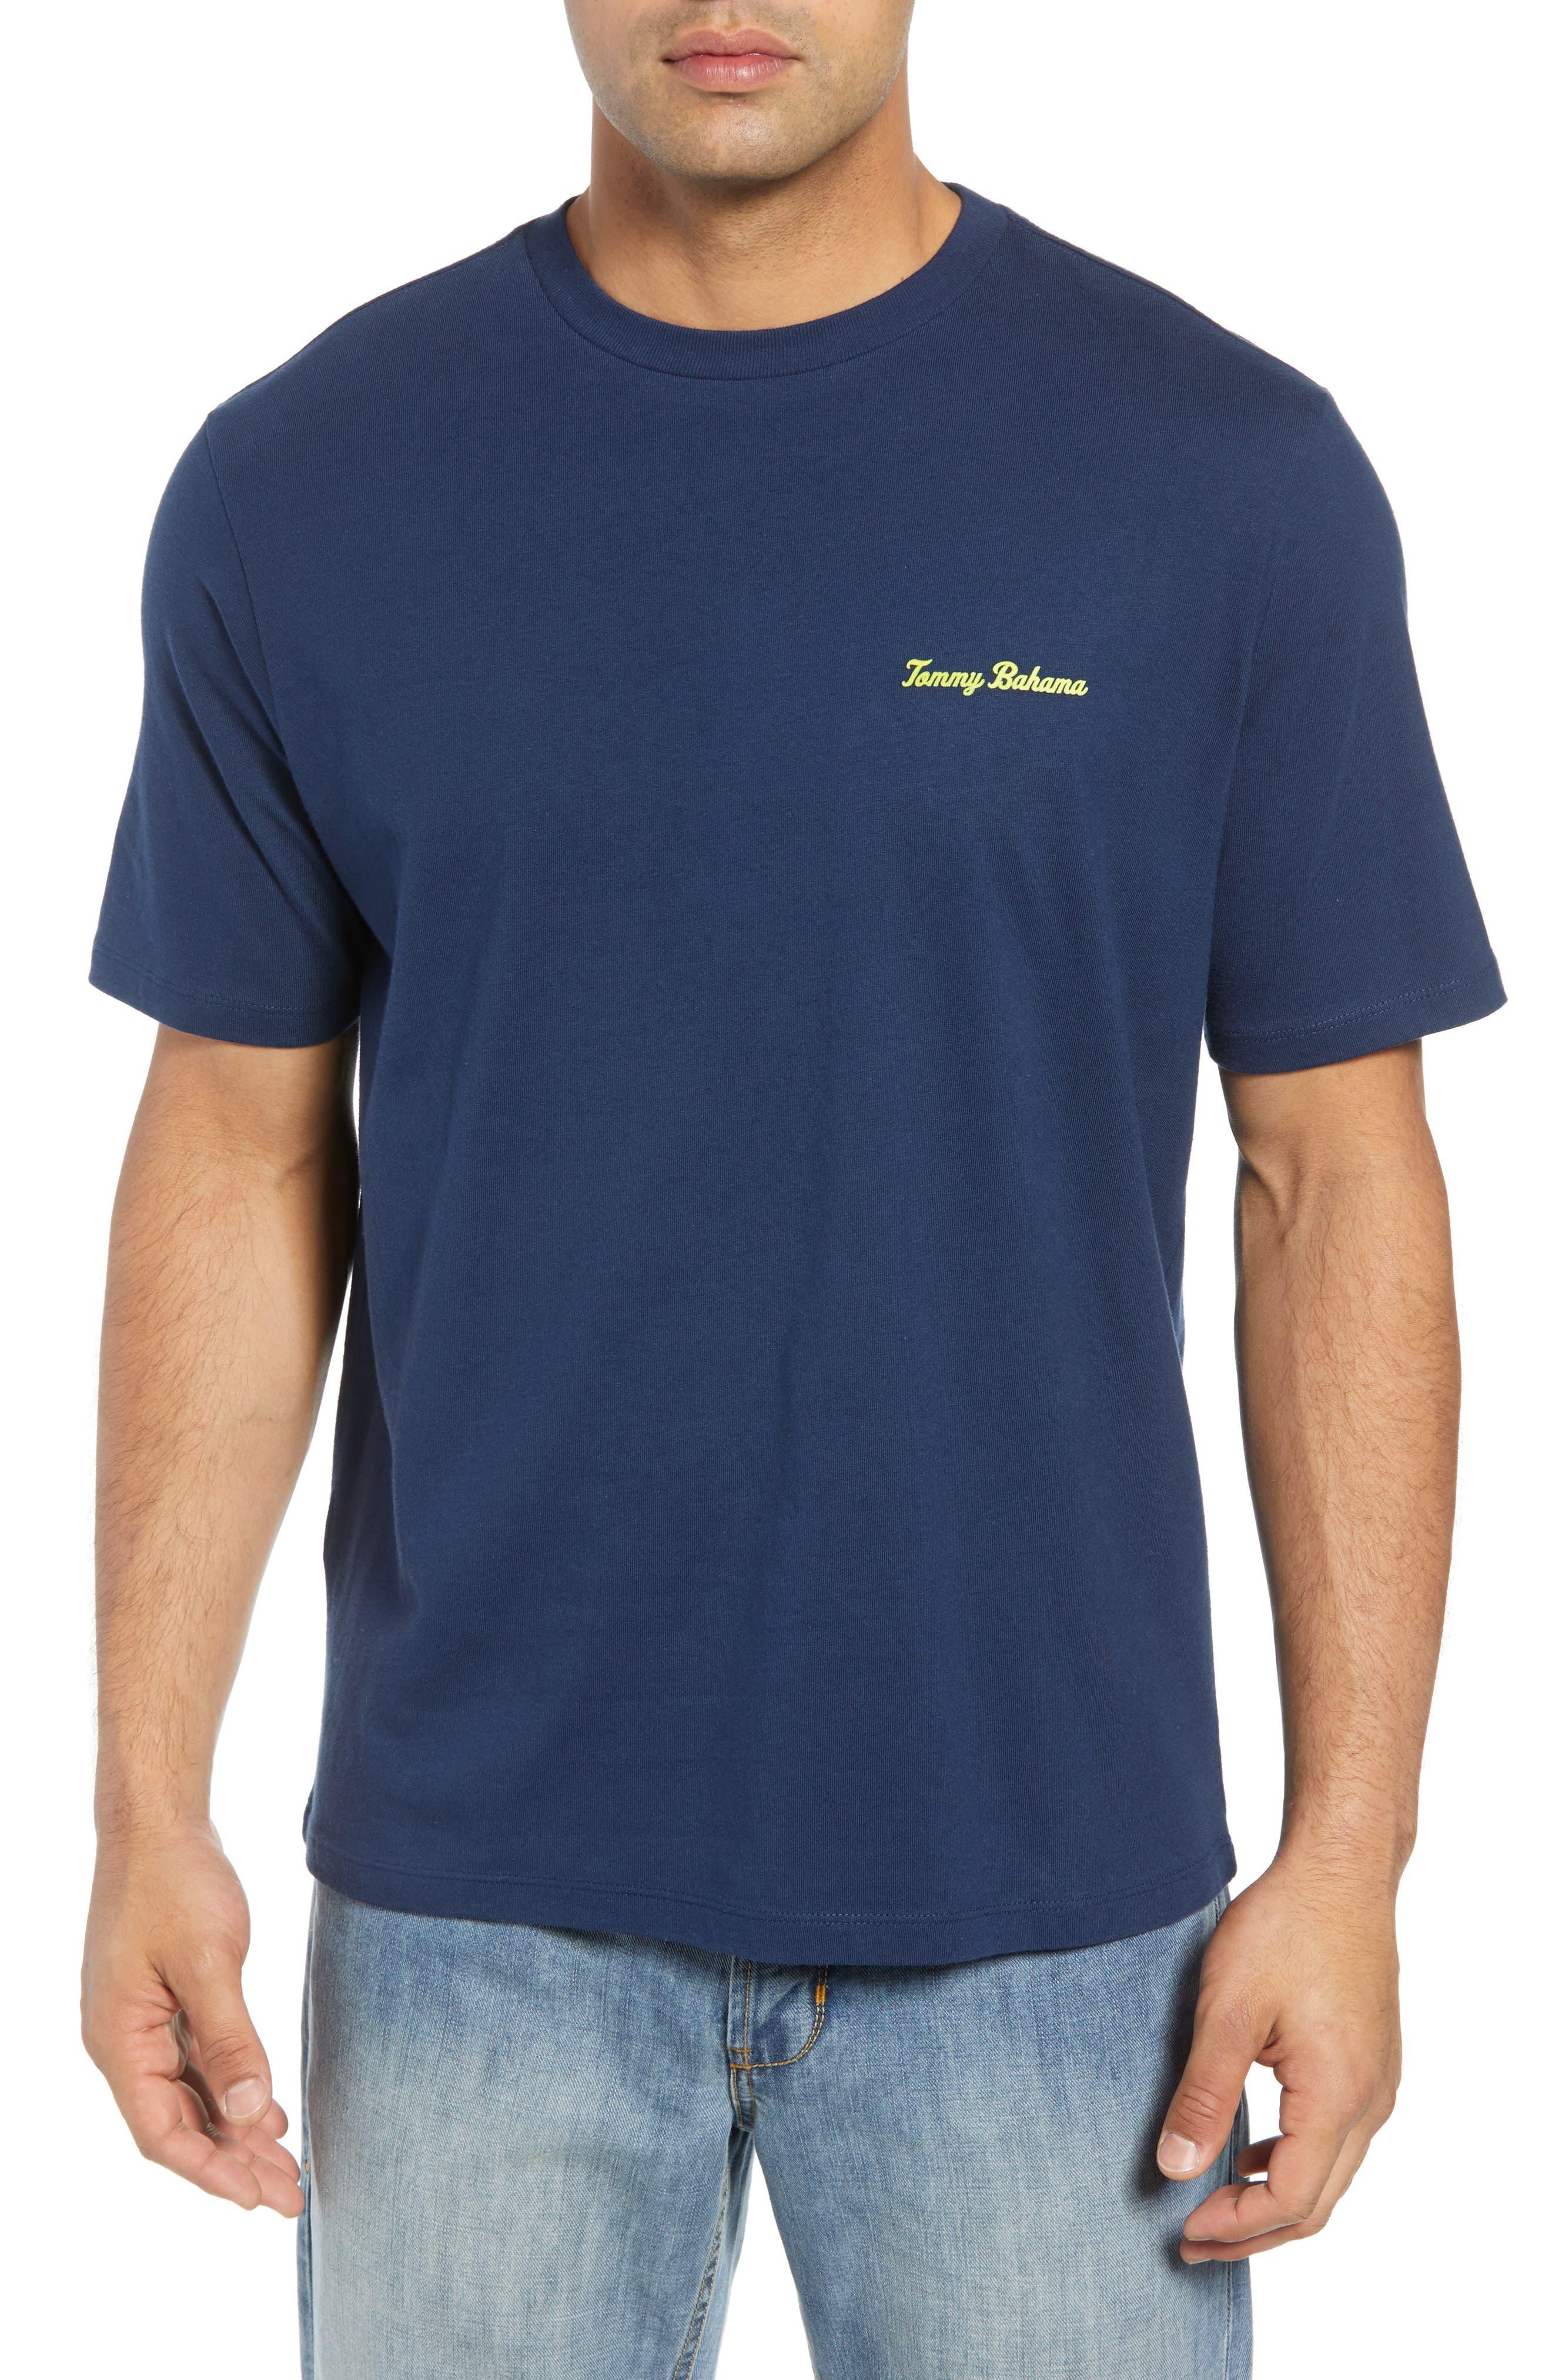 Absolute Parfection T-Shirt,                             Main thumbnail 1, color,                             NAVY